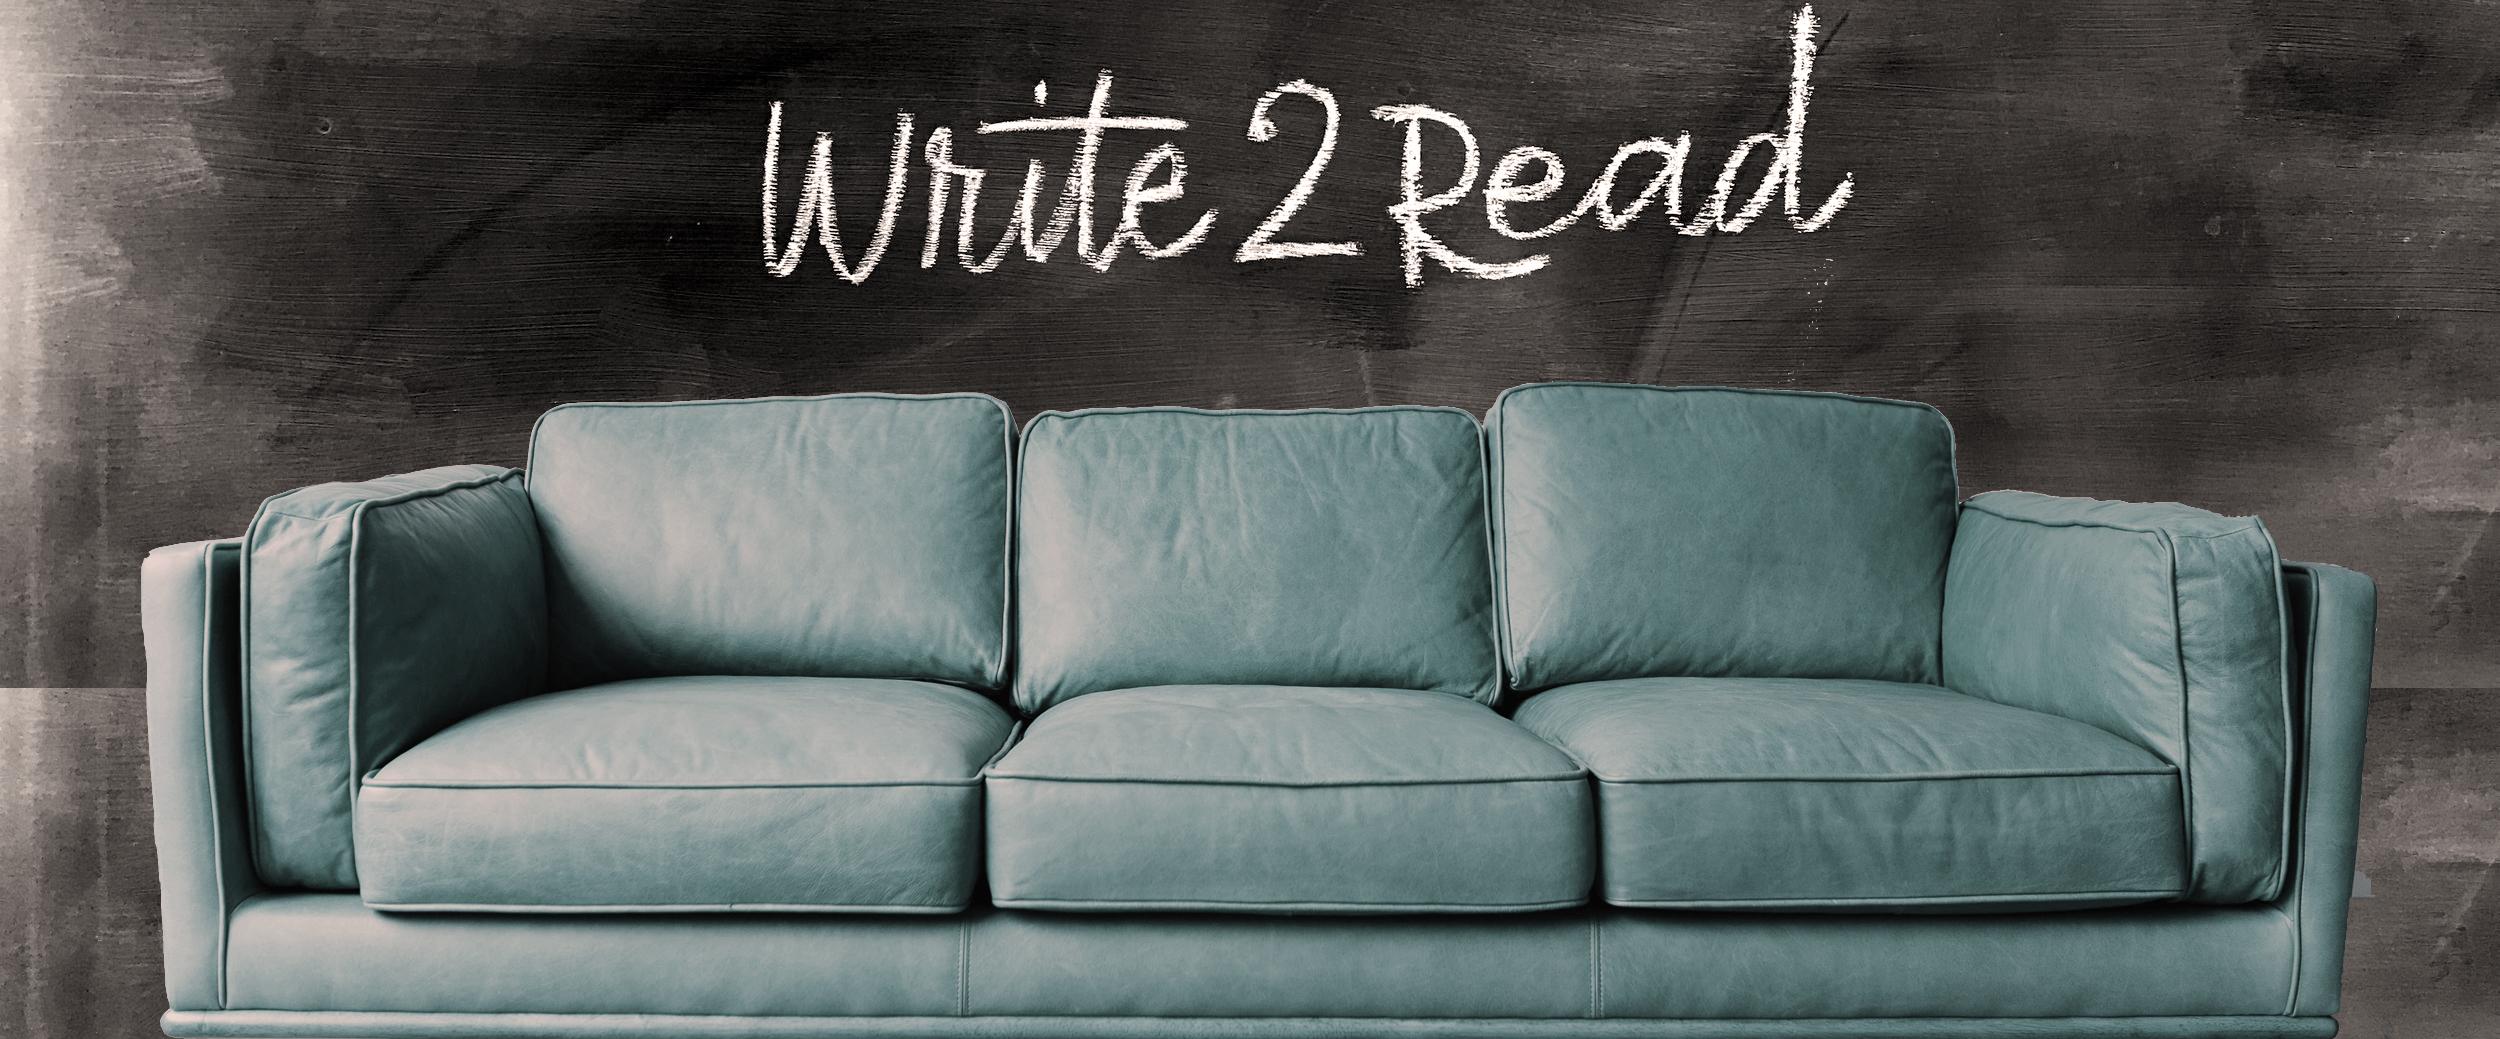 Write2Read.jpg